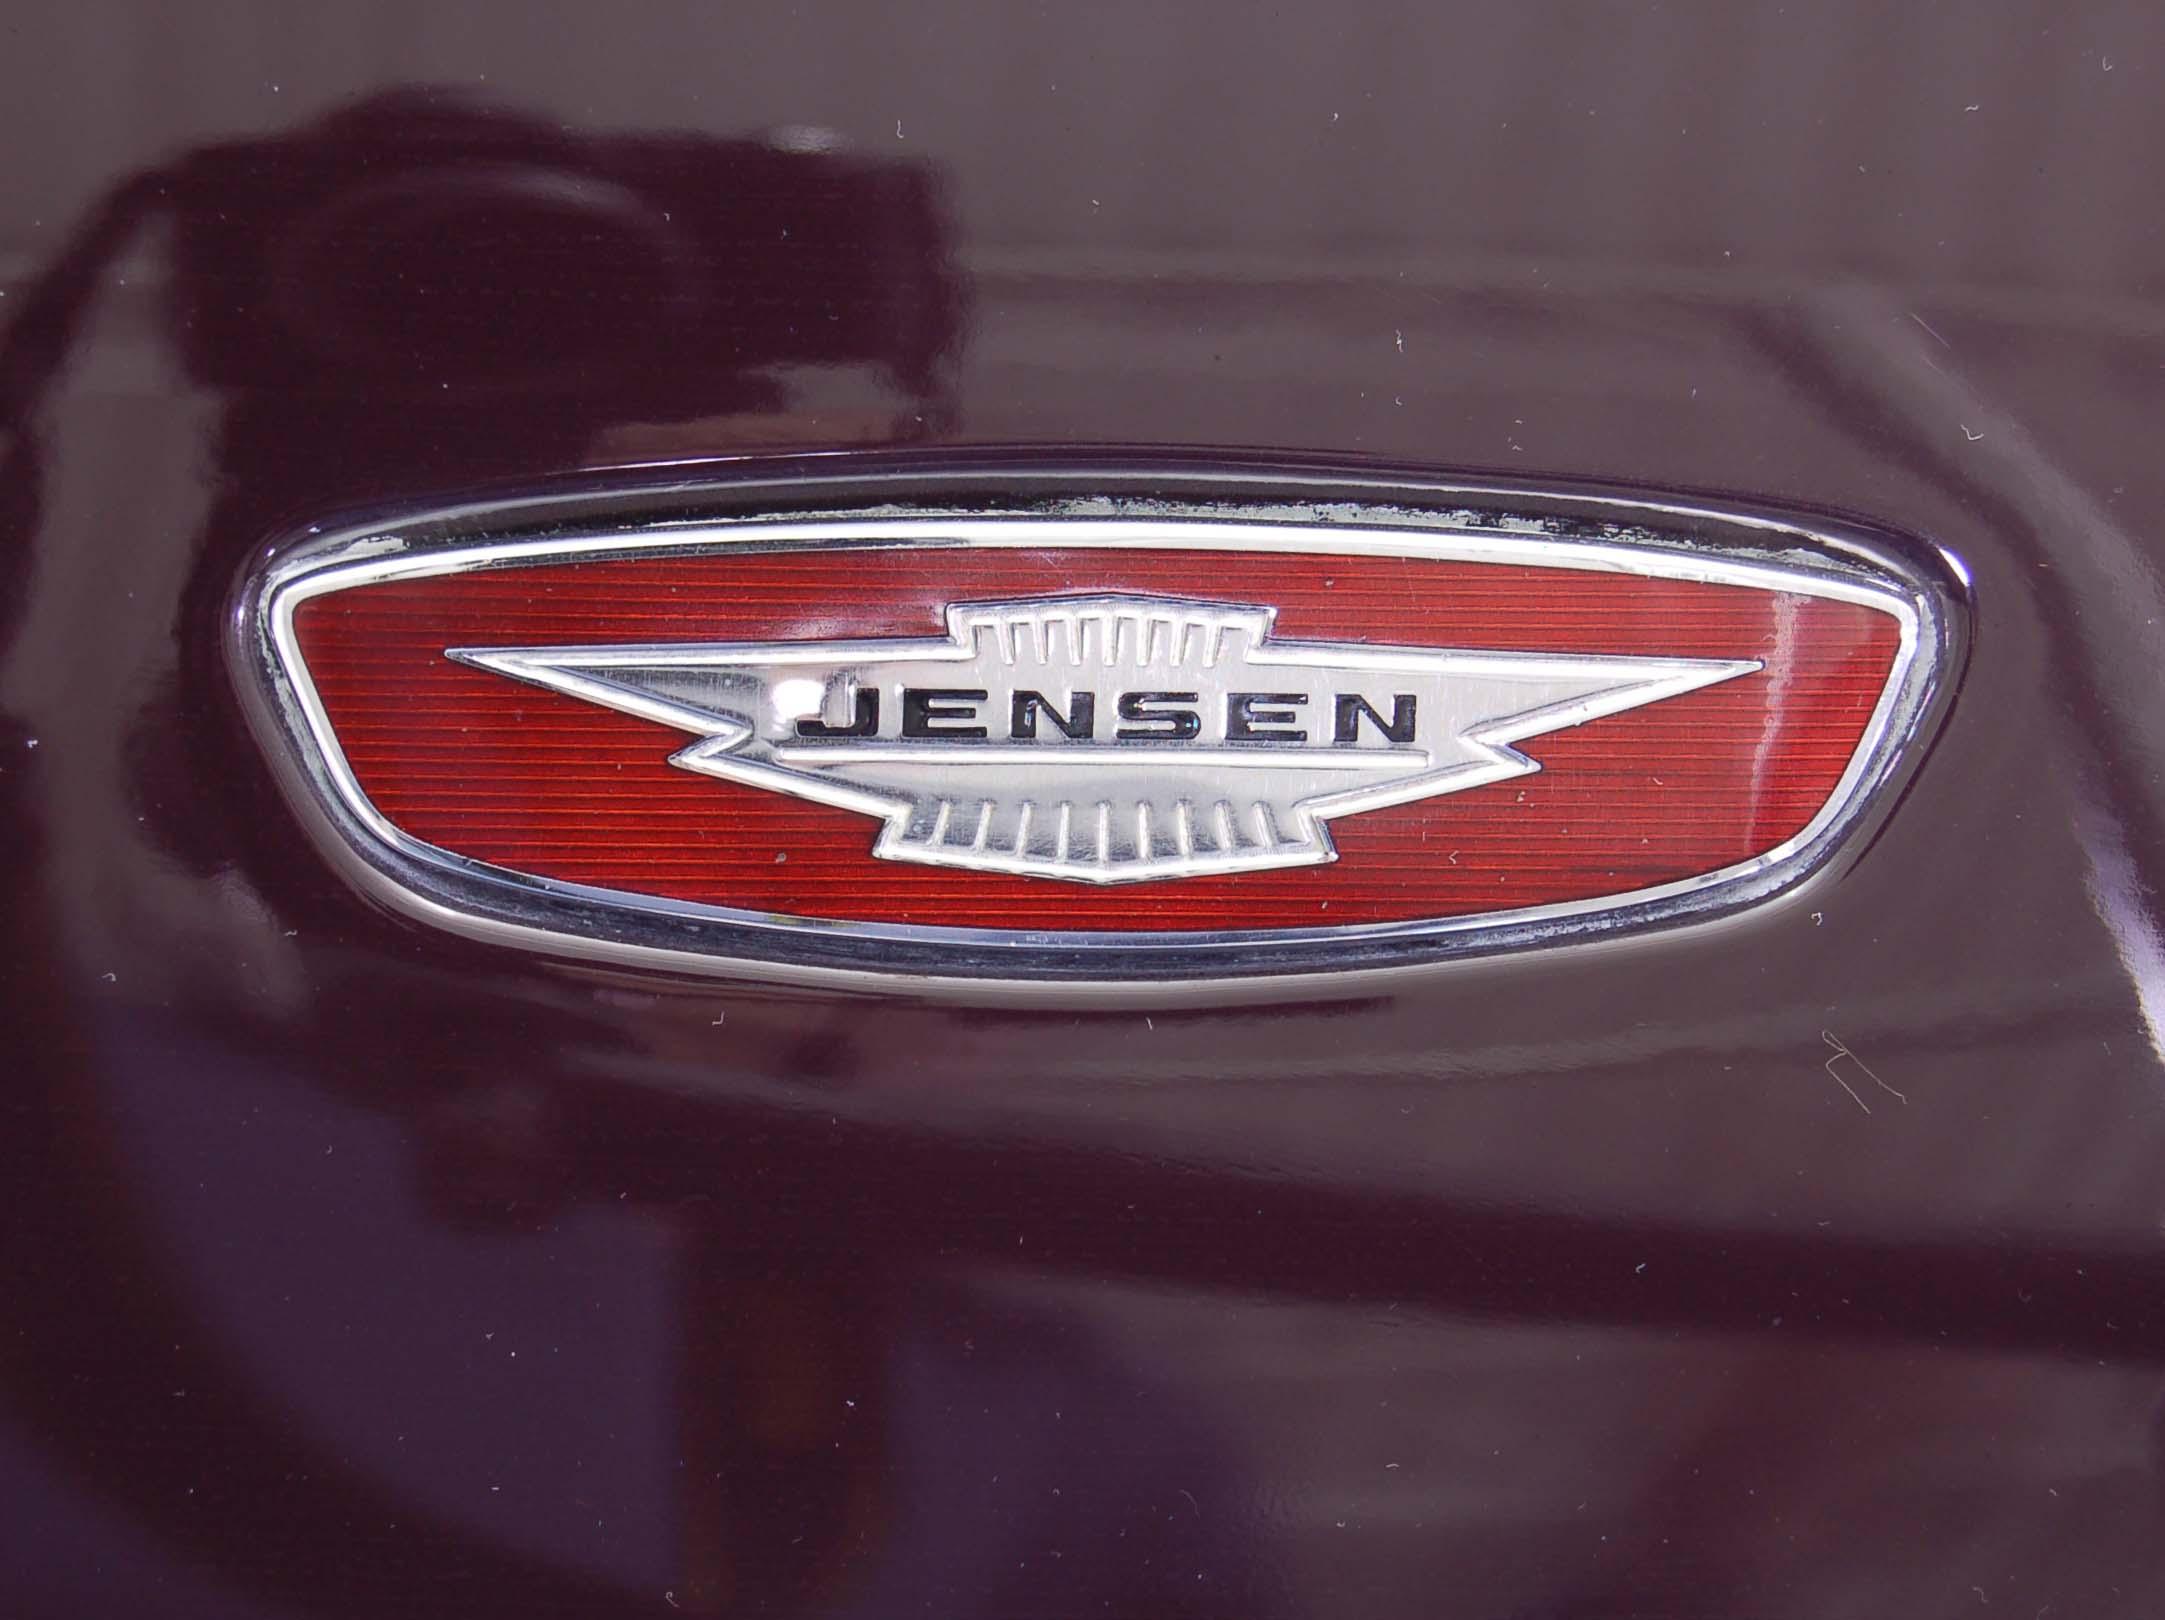 1972 Jensen Interceptor hood badge